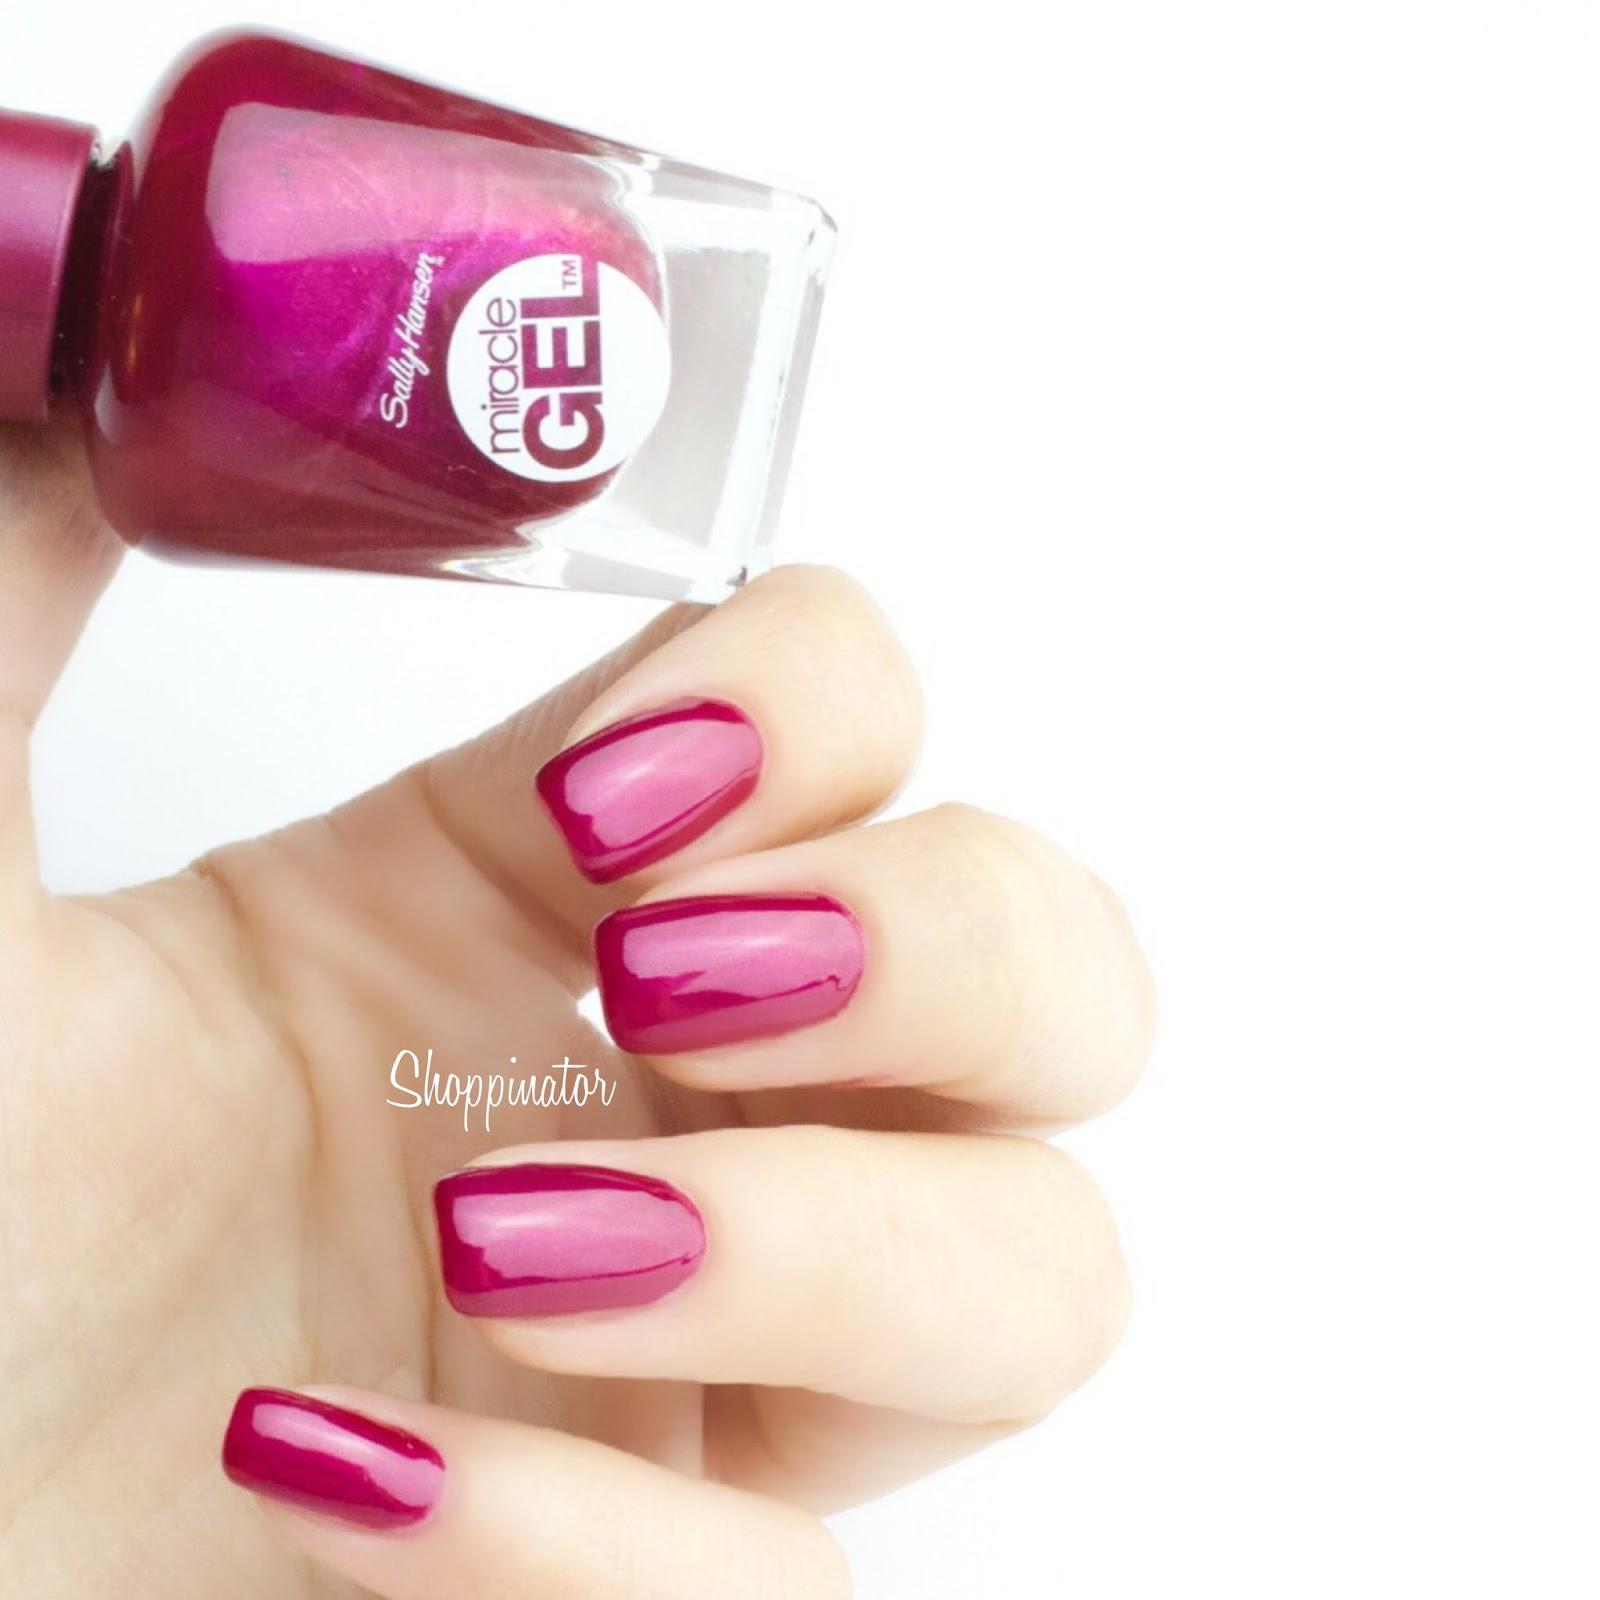 Shoppinator-Sally-Hansen-Gellack-Nagellack-Gelnagellack-Gel-Miracle-Mani-Miracle-Gel-Creme-de-la-Creme-Birthday-Suit-Pinky-Promise-Pretty-Piggy-Pink-Tank-Red-Eye-Mad-Women-Wine-Stock-Tidal-Wave-Blacky-O-Standardsortiment-blau-pink-nude-schwarz-lila-rose-rosa